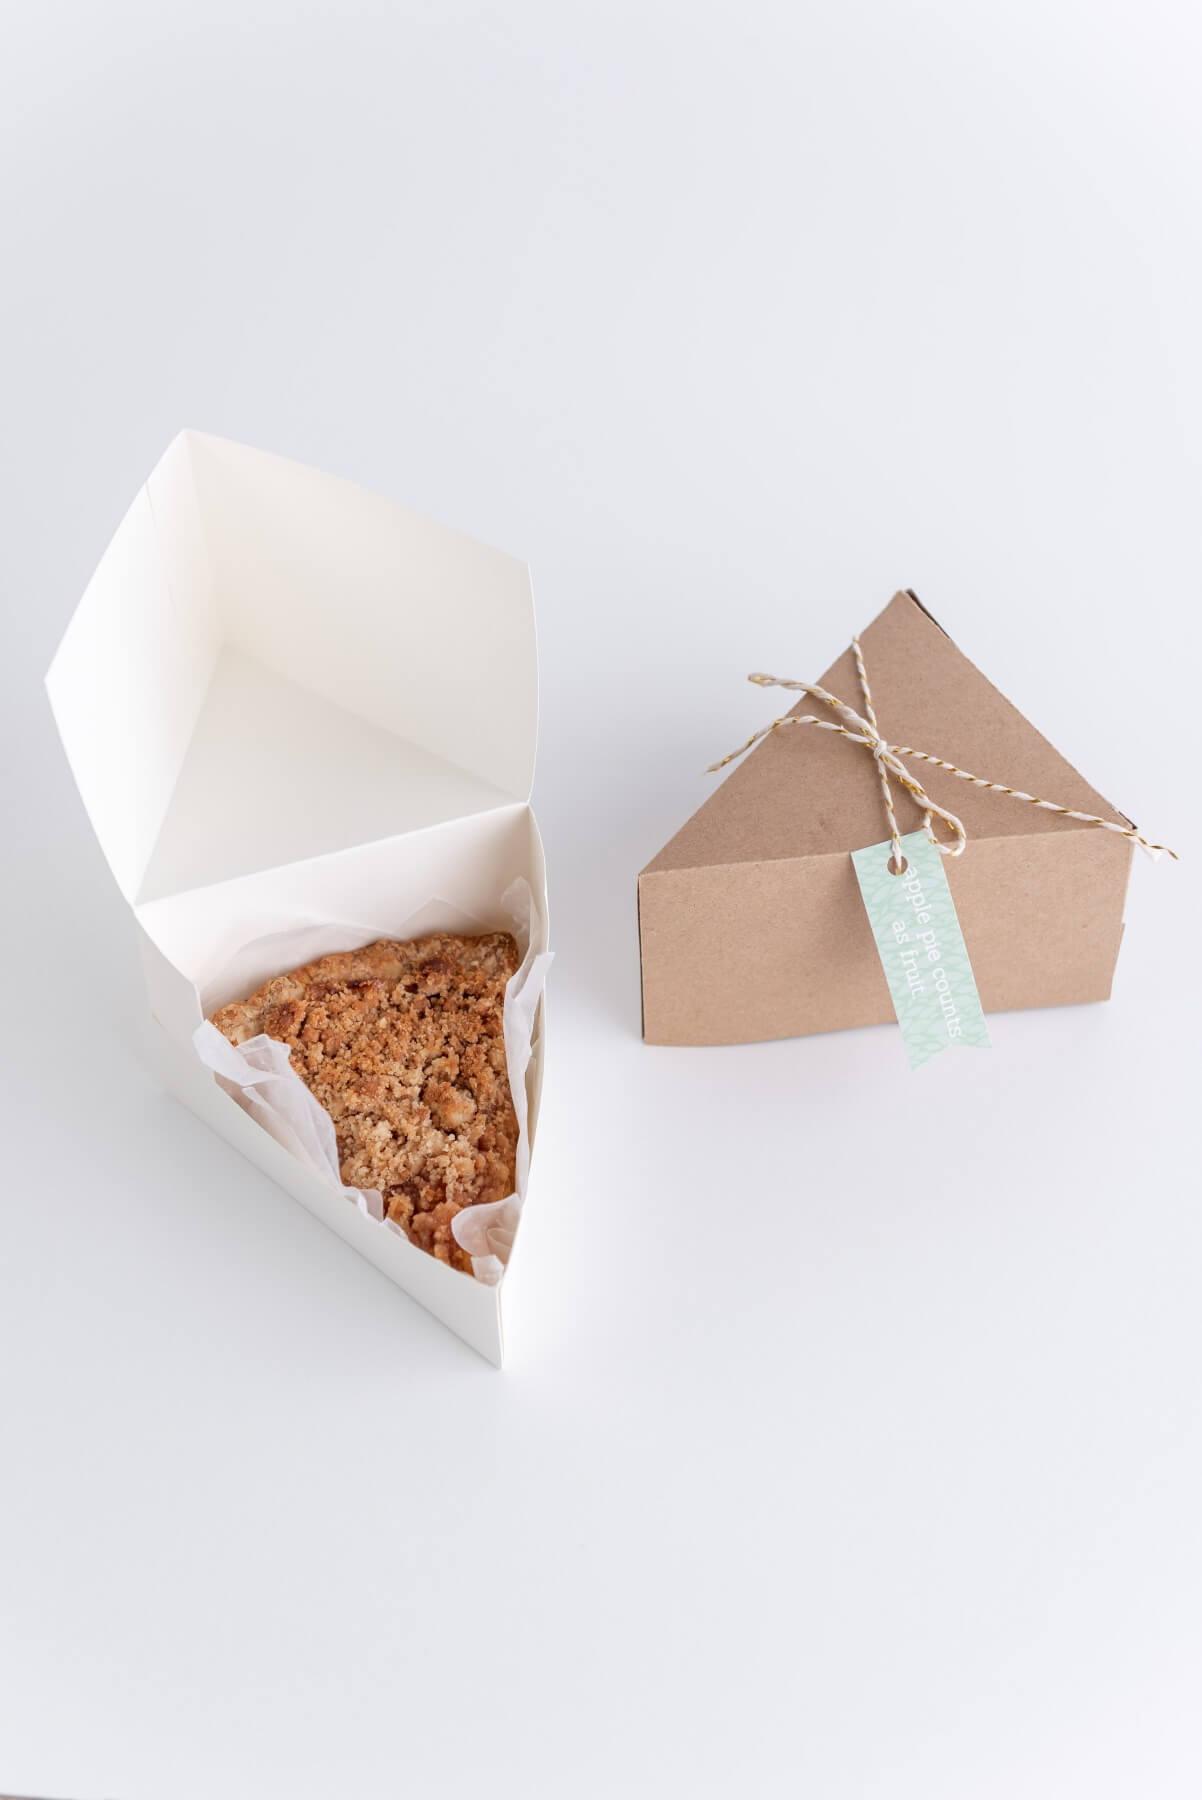 how to make a cricut cut pie slice box diy tutorial